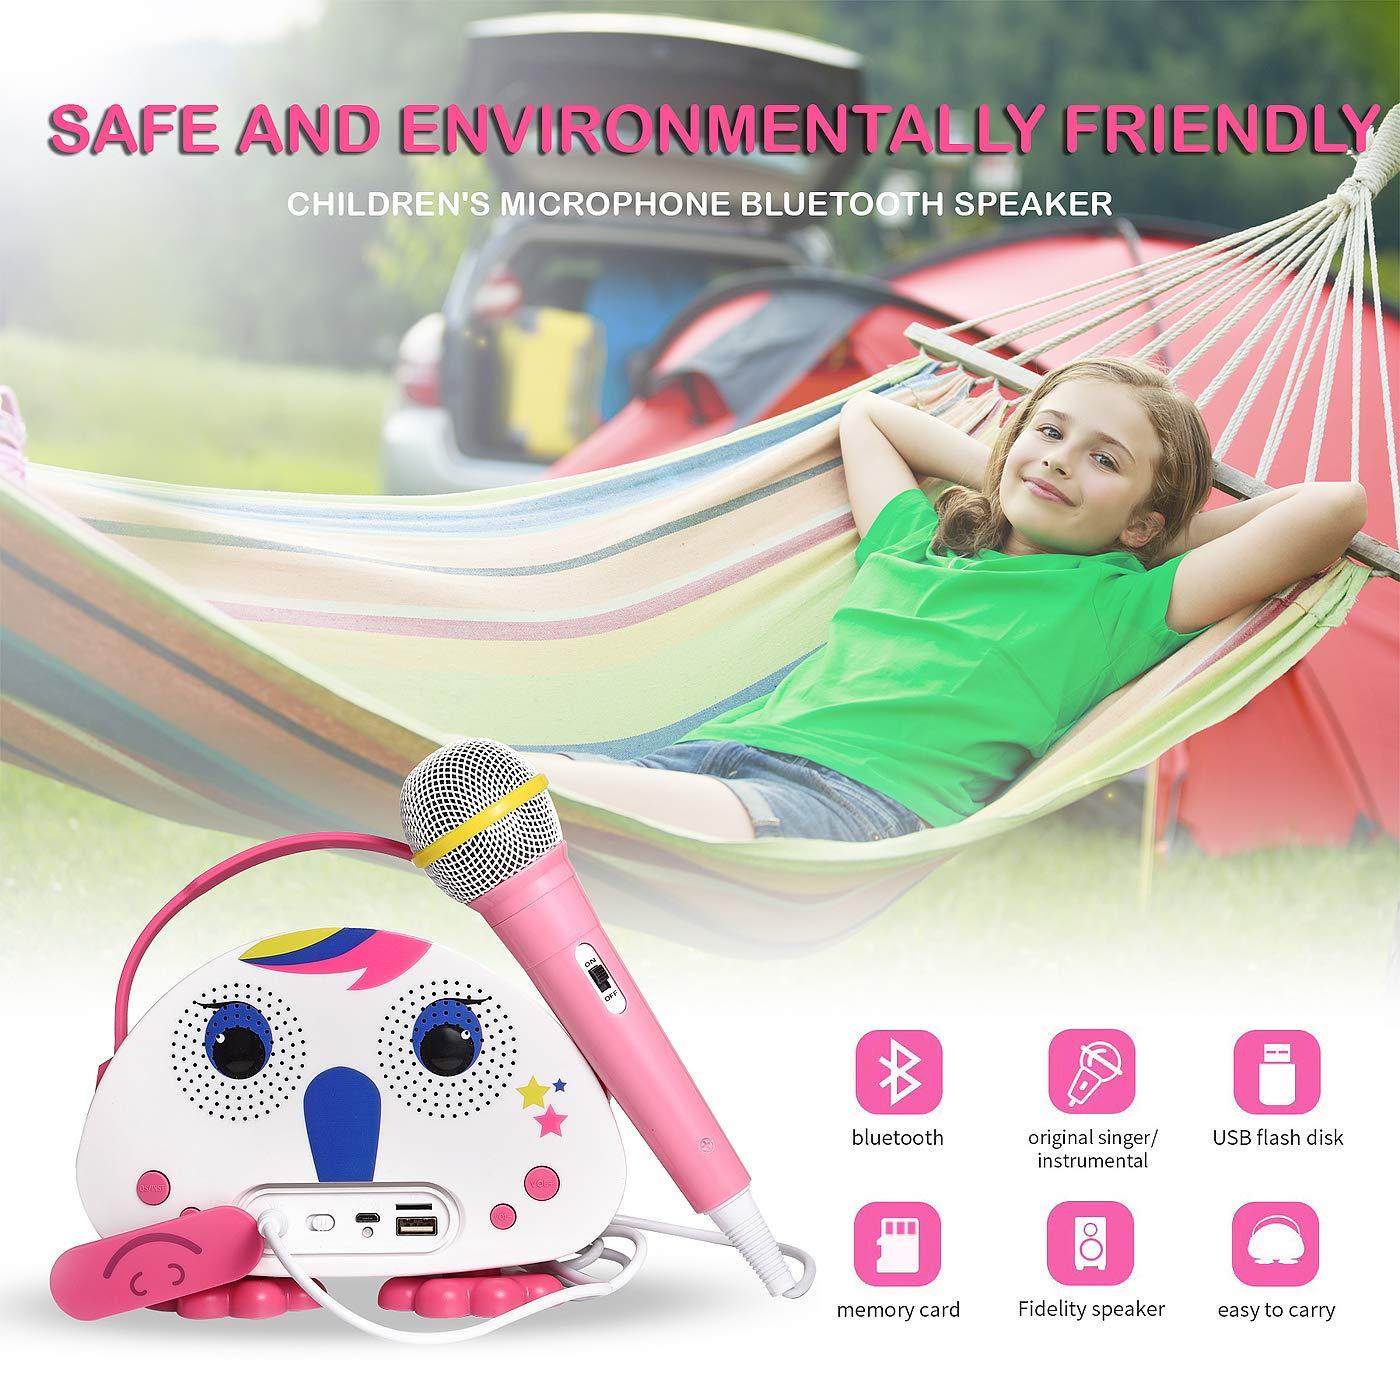 HowQ Outdoor Toys Karaoke Machine , Portable Kids Karaoke Bluetooth Speaker Wireless Cartoon Speaker for Kids for Indoor Toys Travel Activities with Microphone Karaoke Machine(Pink-White) by HowQ (Image #7)